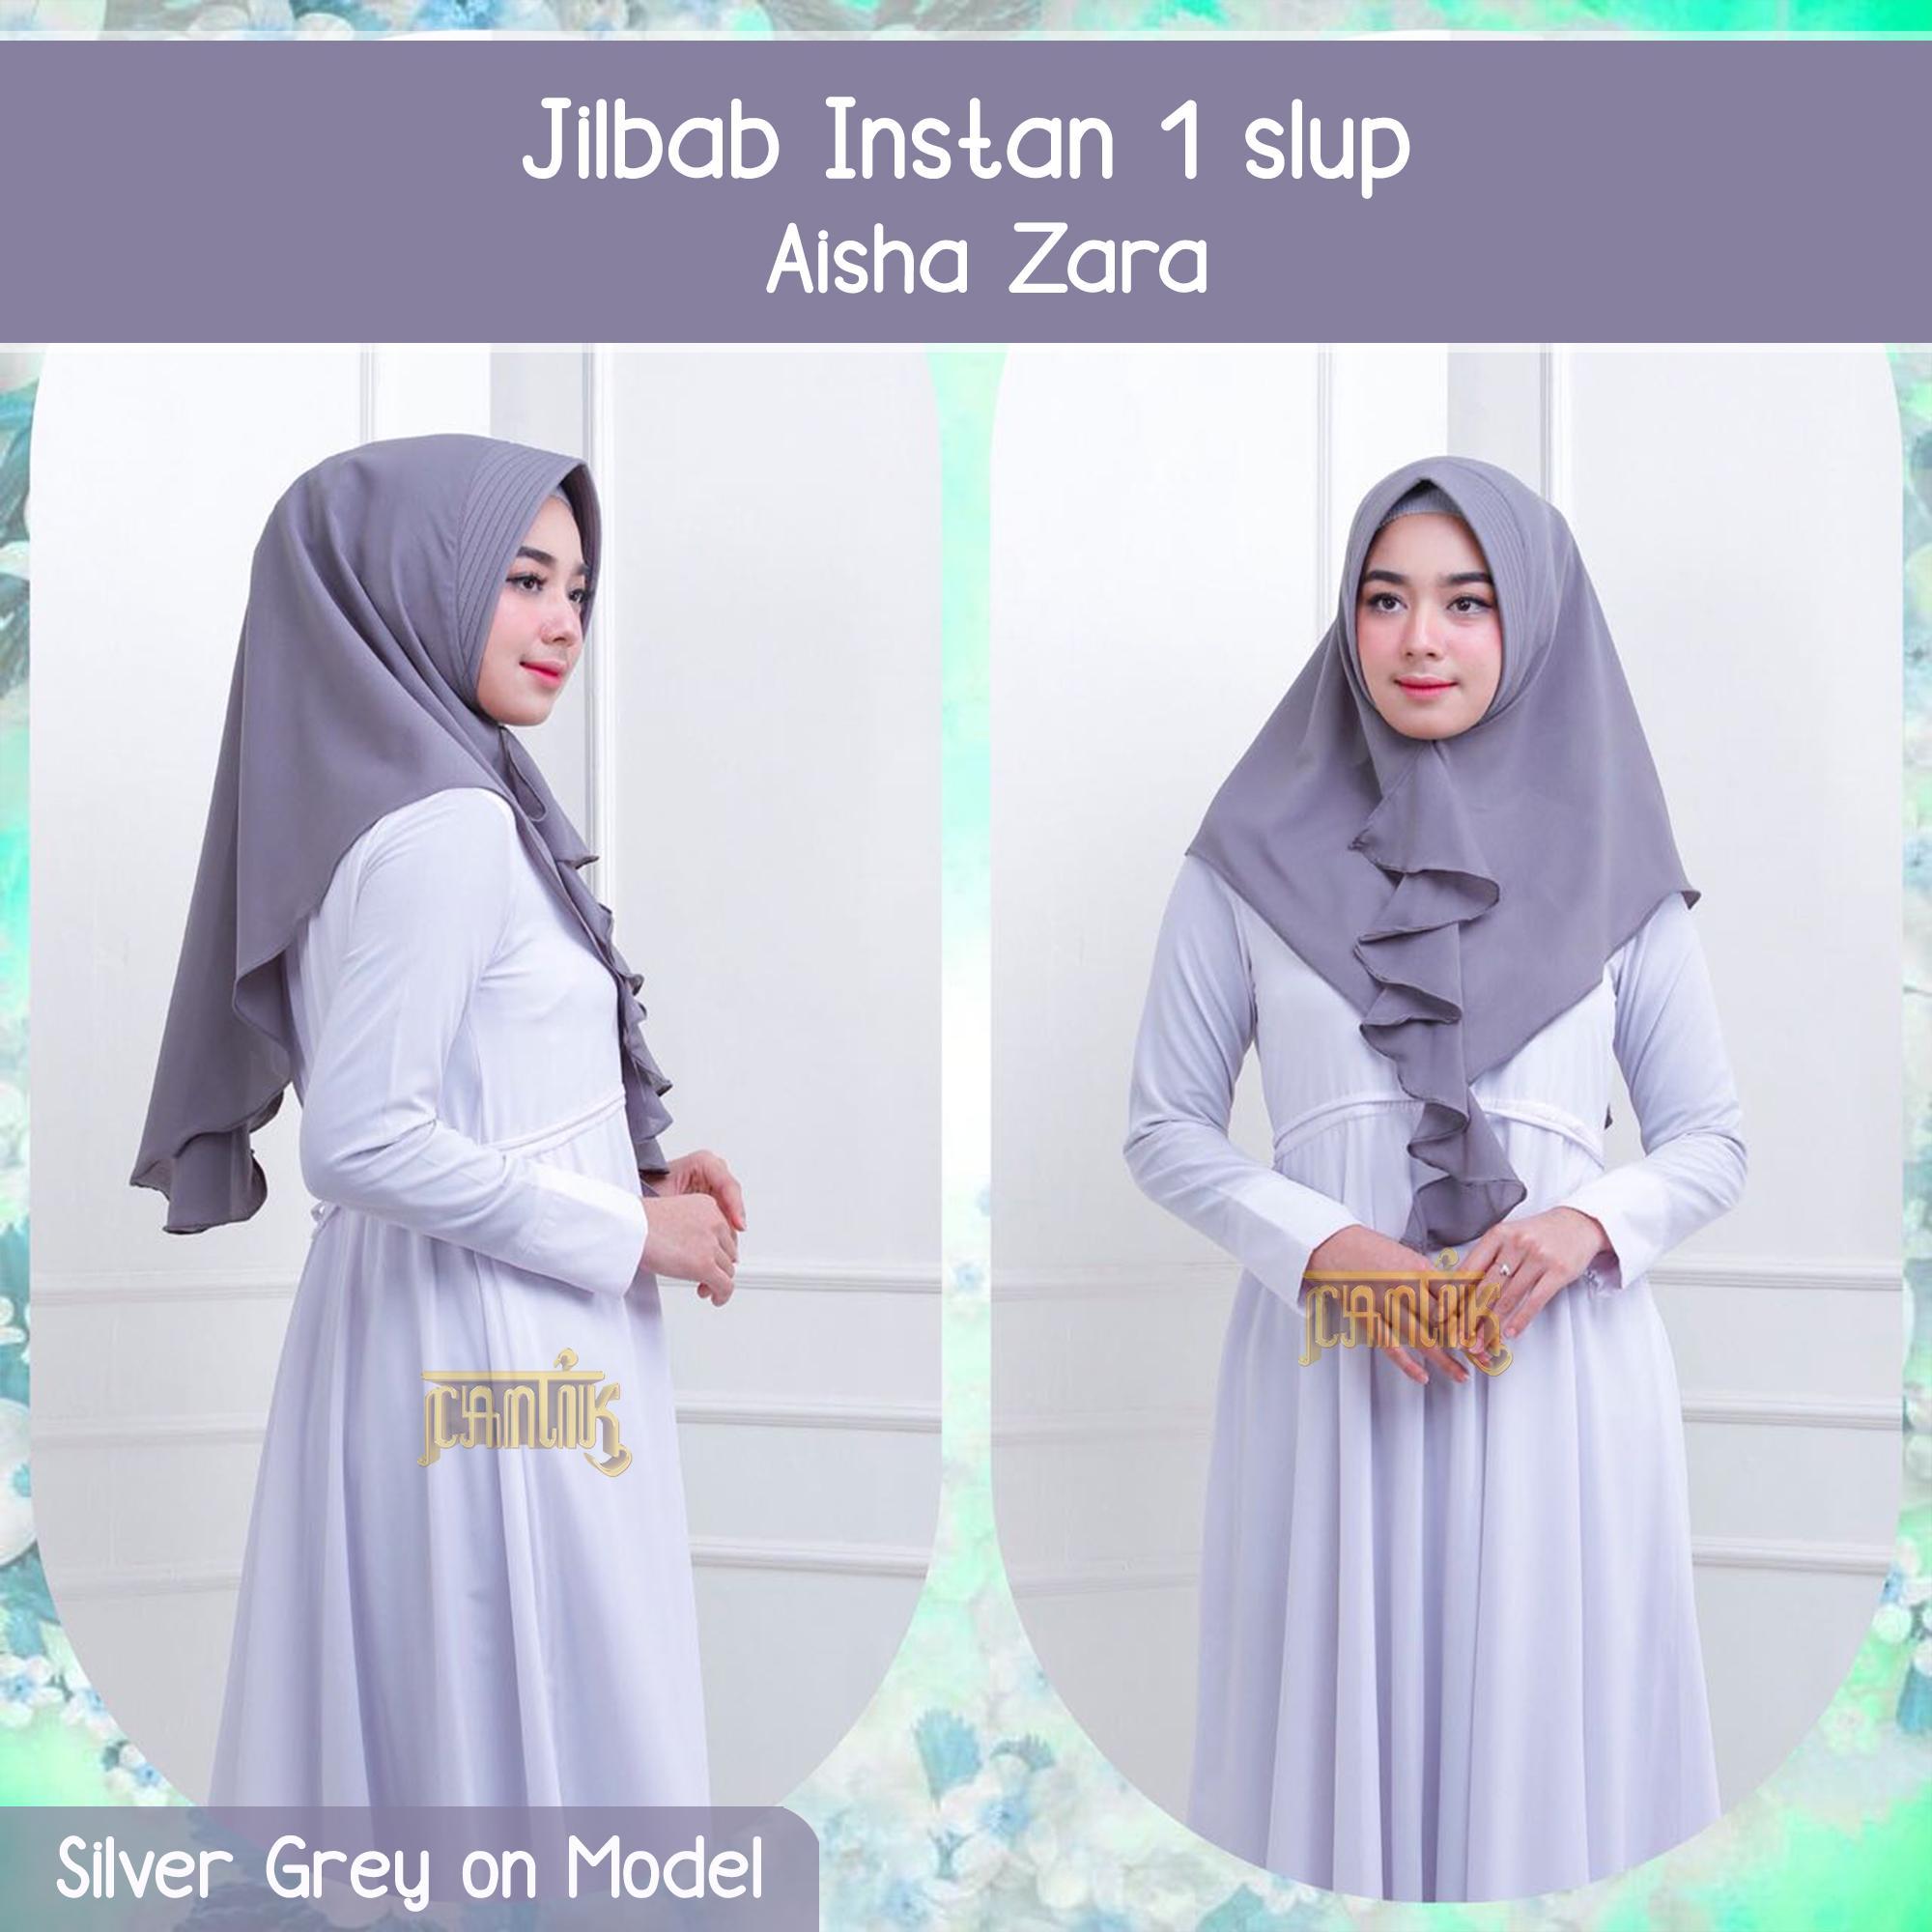 Jilbab Instan 1 Slup Aisha Zara